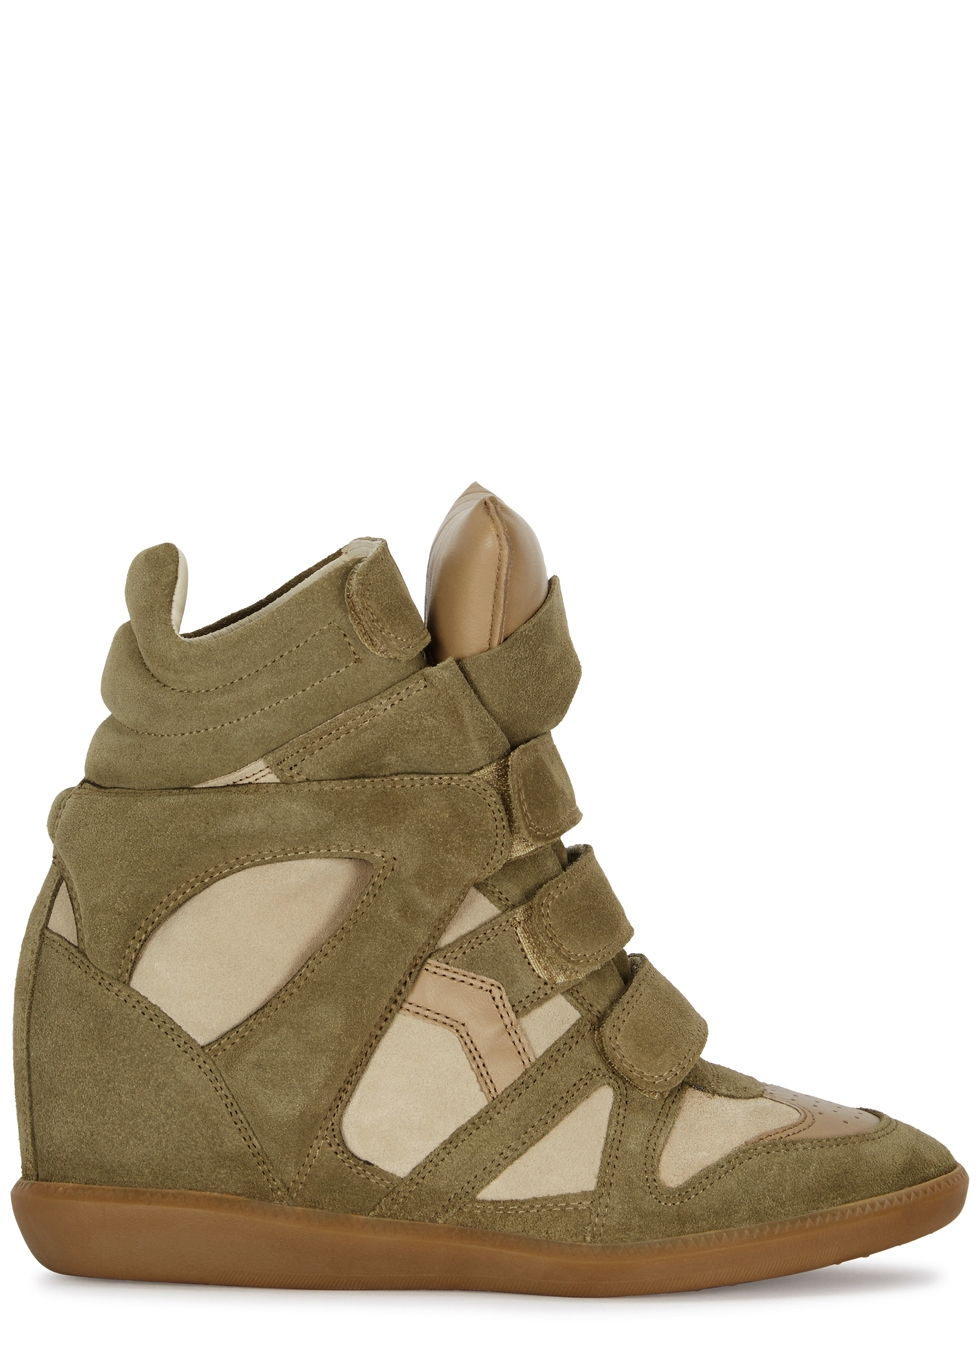 2ead4ab9e8 Isabel Marant Bekett 90 olive suede wedge sneakers - Harvey Nichols